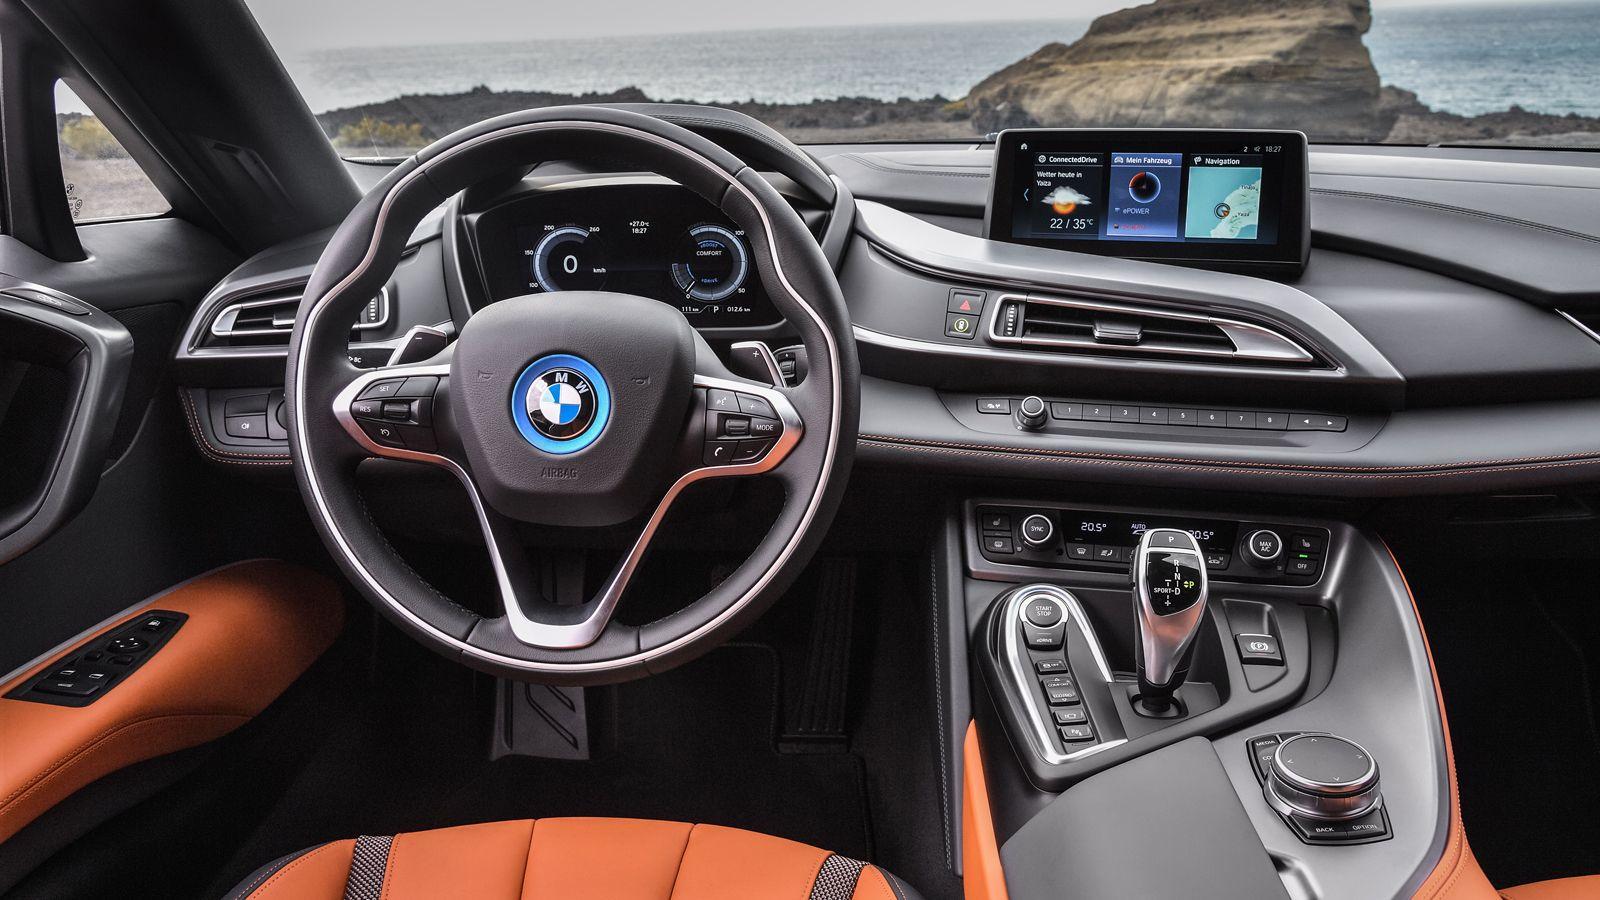 2019 Bmw I8 Roadster Interior